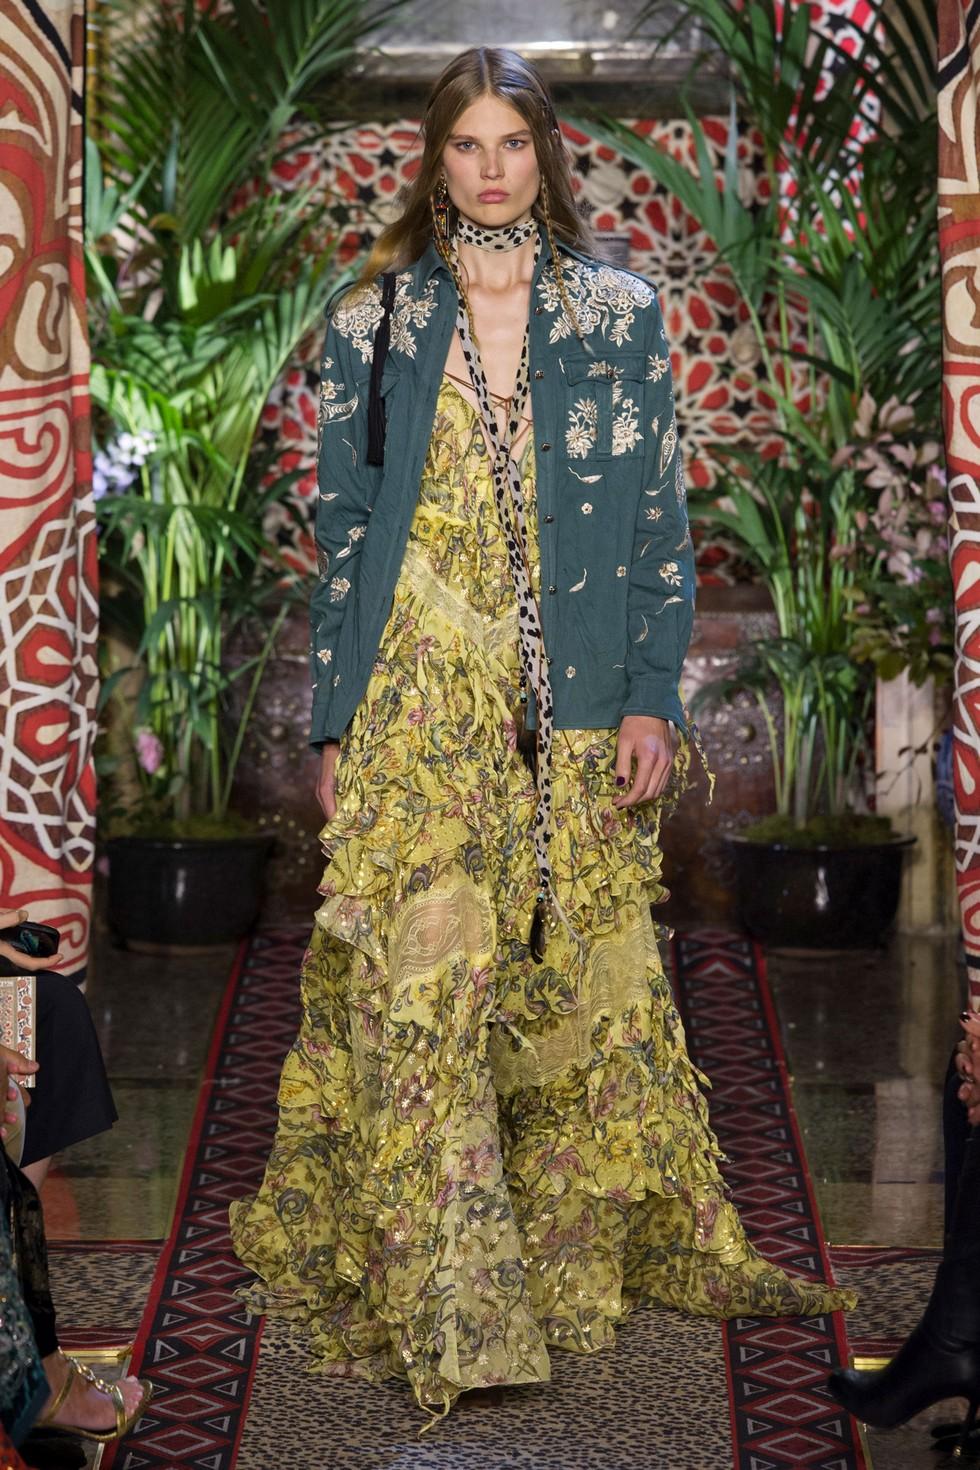 Roberto Cavalli fashion dresses milan fashion spring summer 2017 Milan Fashion Spring Summer 2017 – day one best moments Roberto Cavalli 1